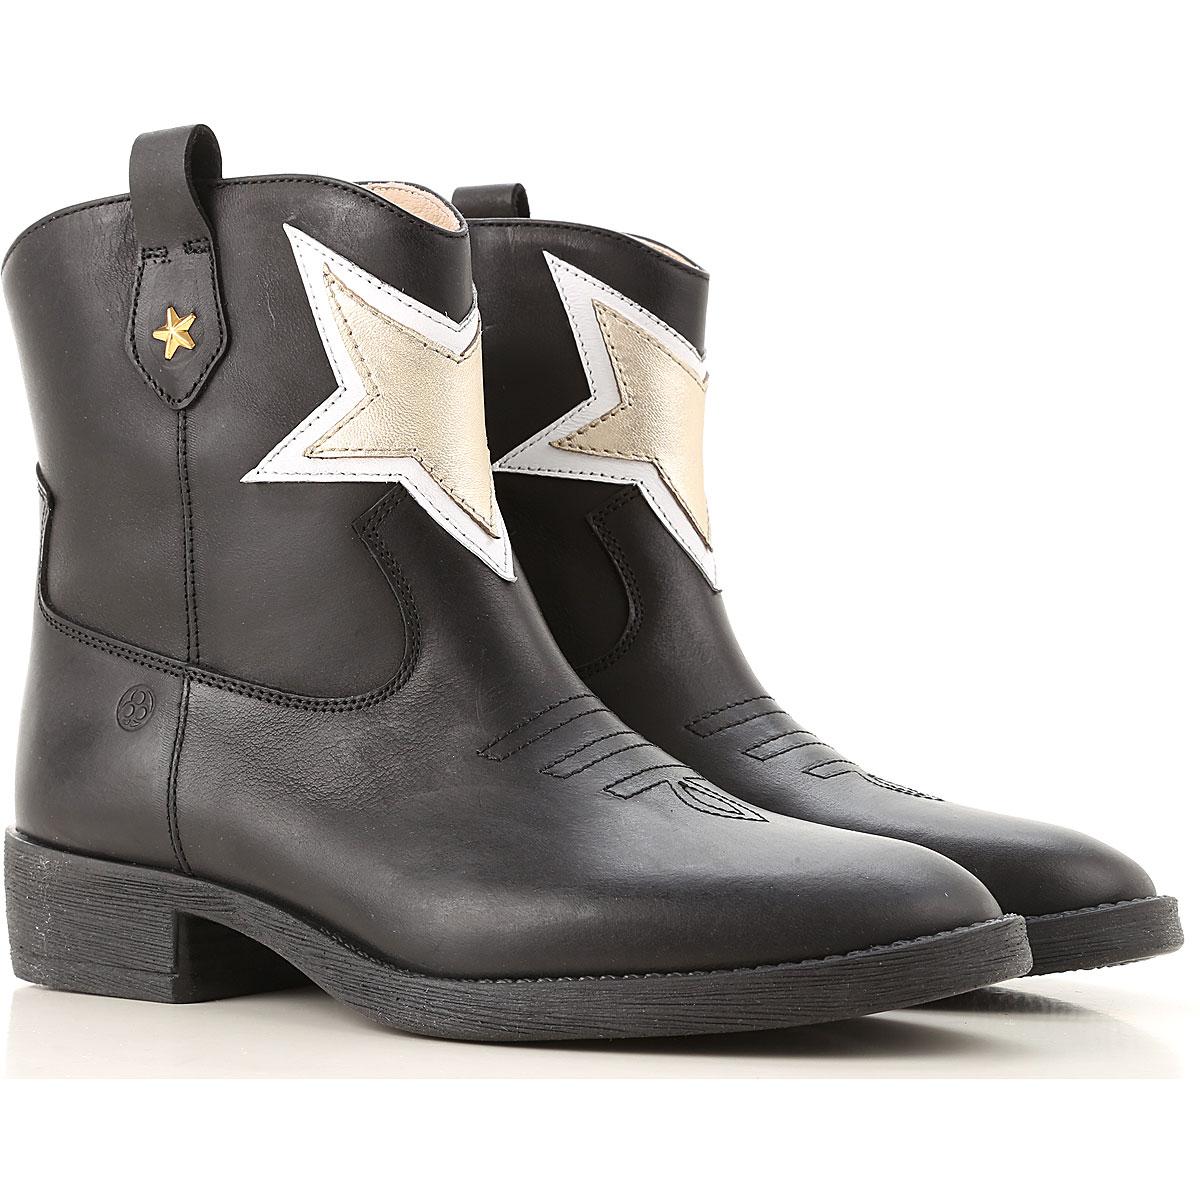 Florens Kids Shoes for Girls On Sale, Black, Rubber, 2019, 31 32 33 34 35 36 37 38